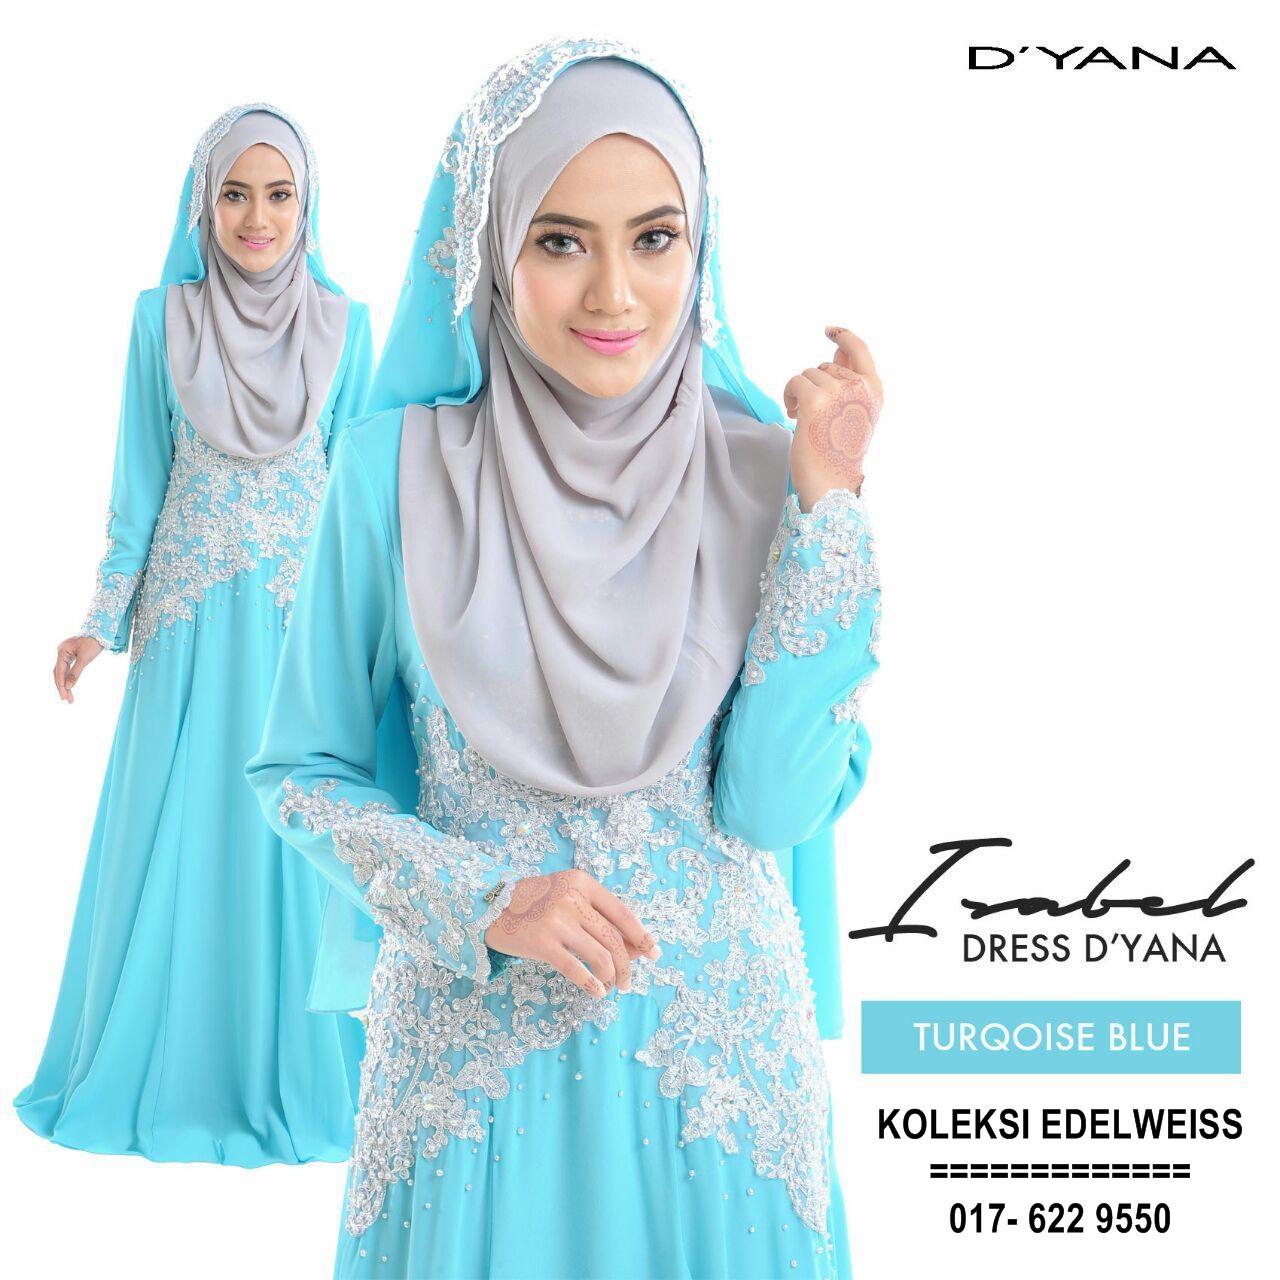 KOLEKSI EDELWEISS Baju Pengantin Baju Nikah dan Tunang